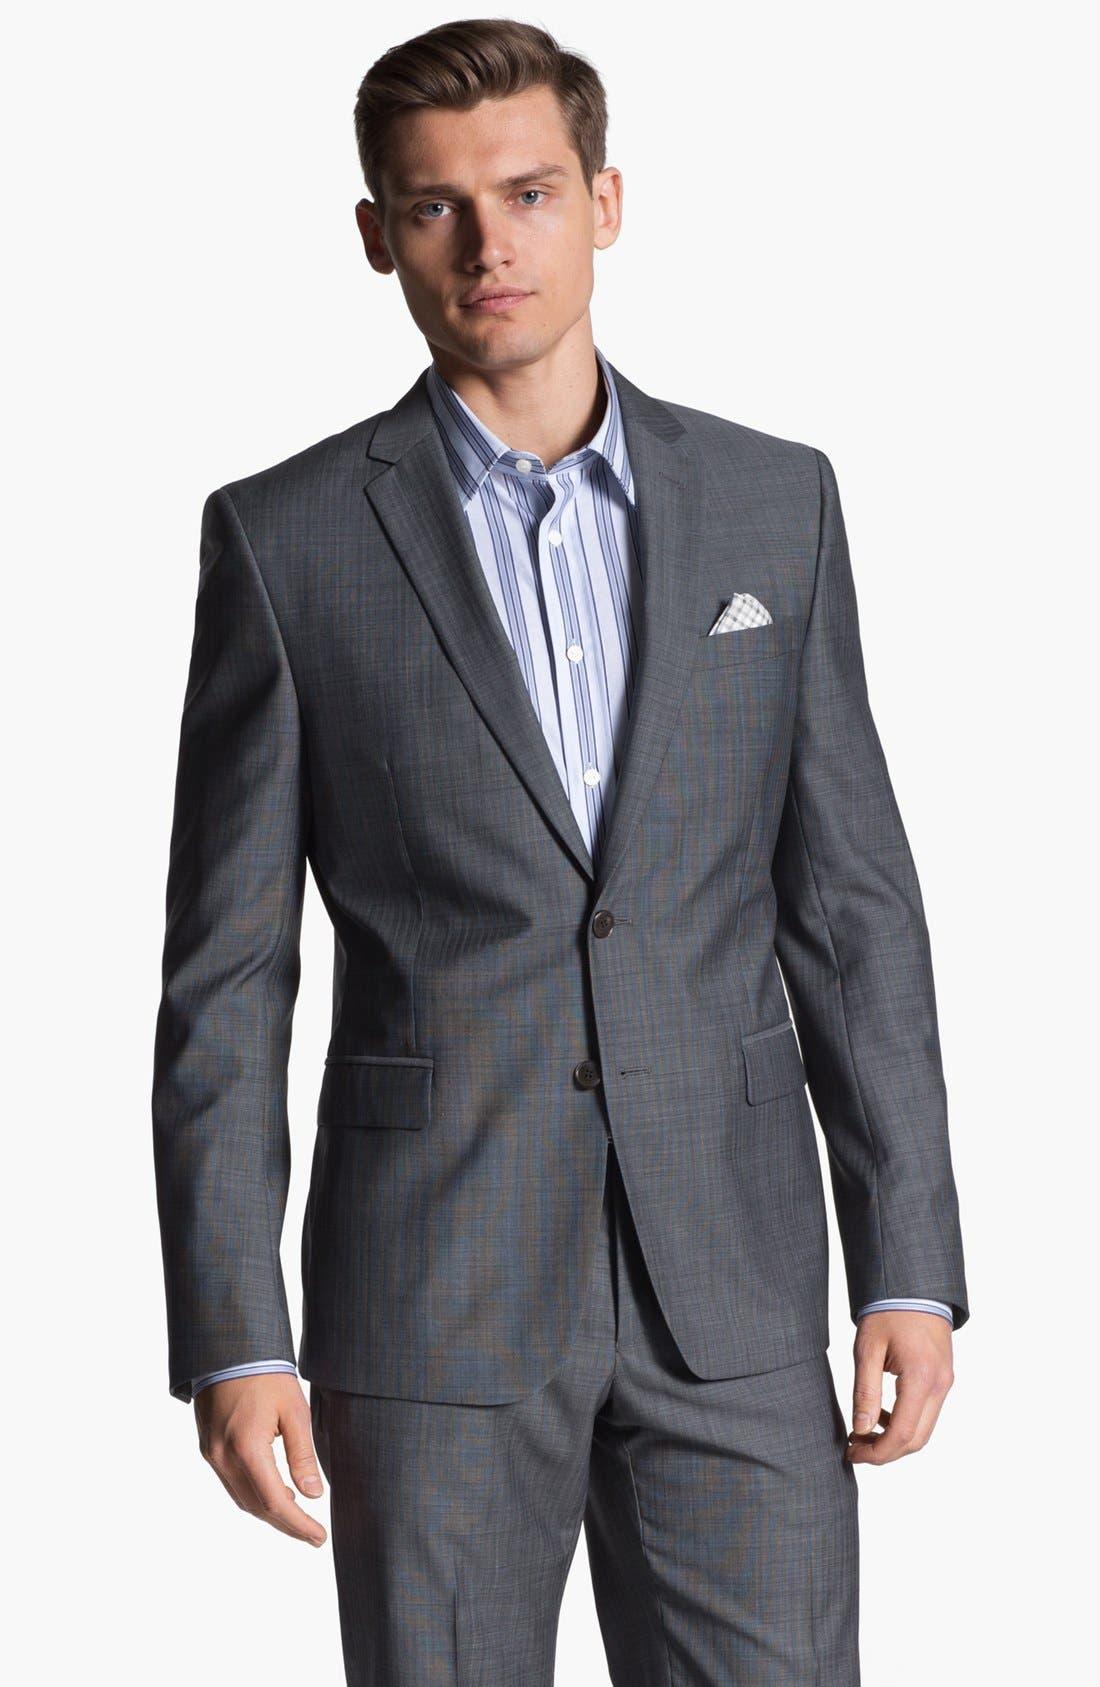 Alternate Image 1 Selected - Versace Trim Fit Wool Blend Suit